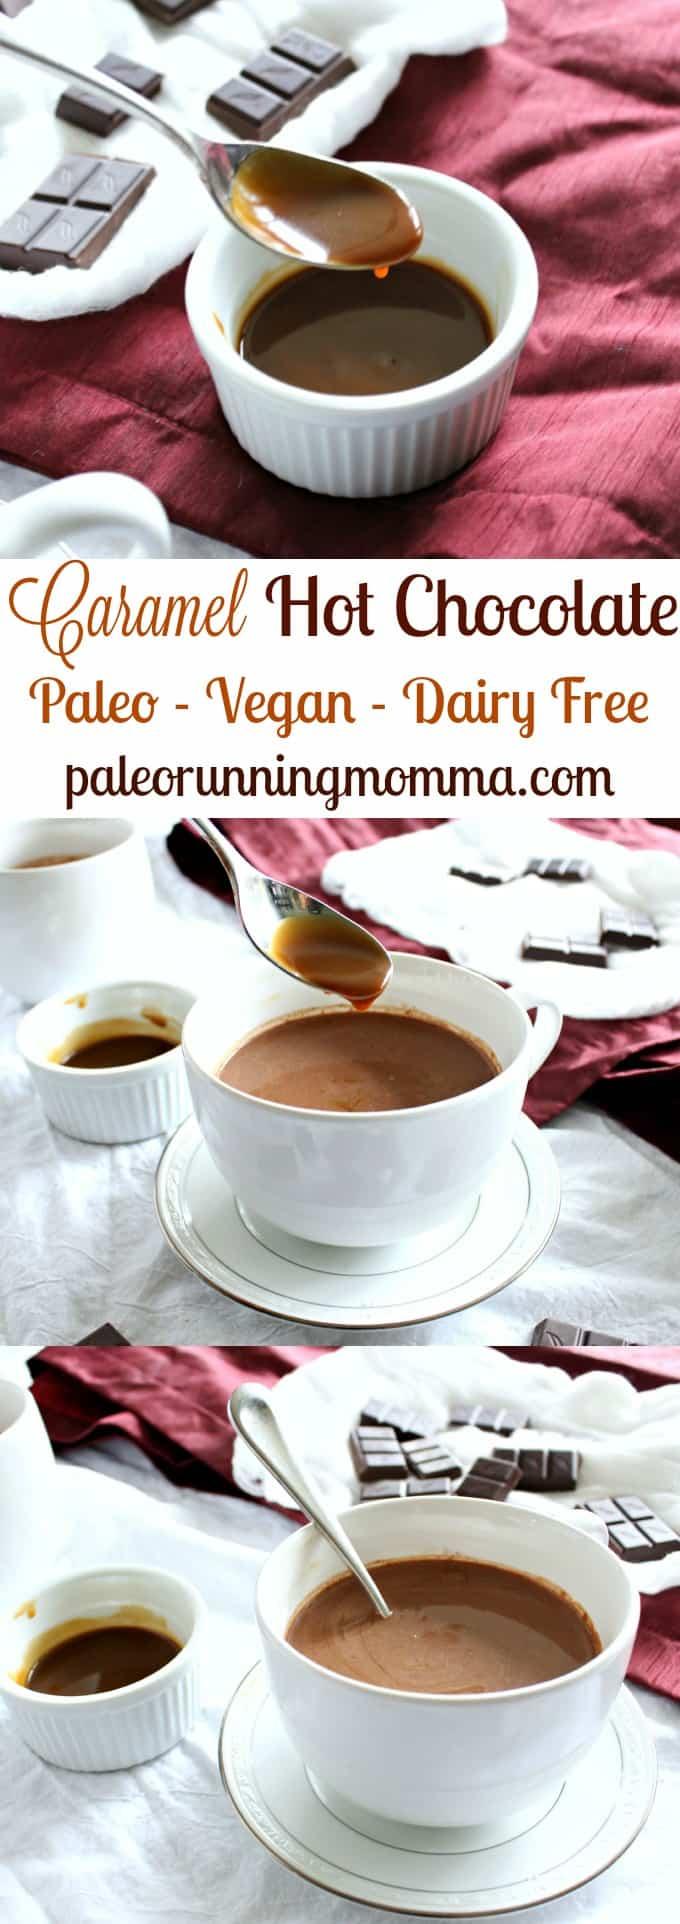 Caramel Hot Chocolate - Paleo, vegan, dairy free! Rich and creamy almond milk hot chocolate swirled with easy dairy free caramel sauce